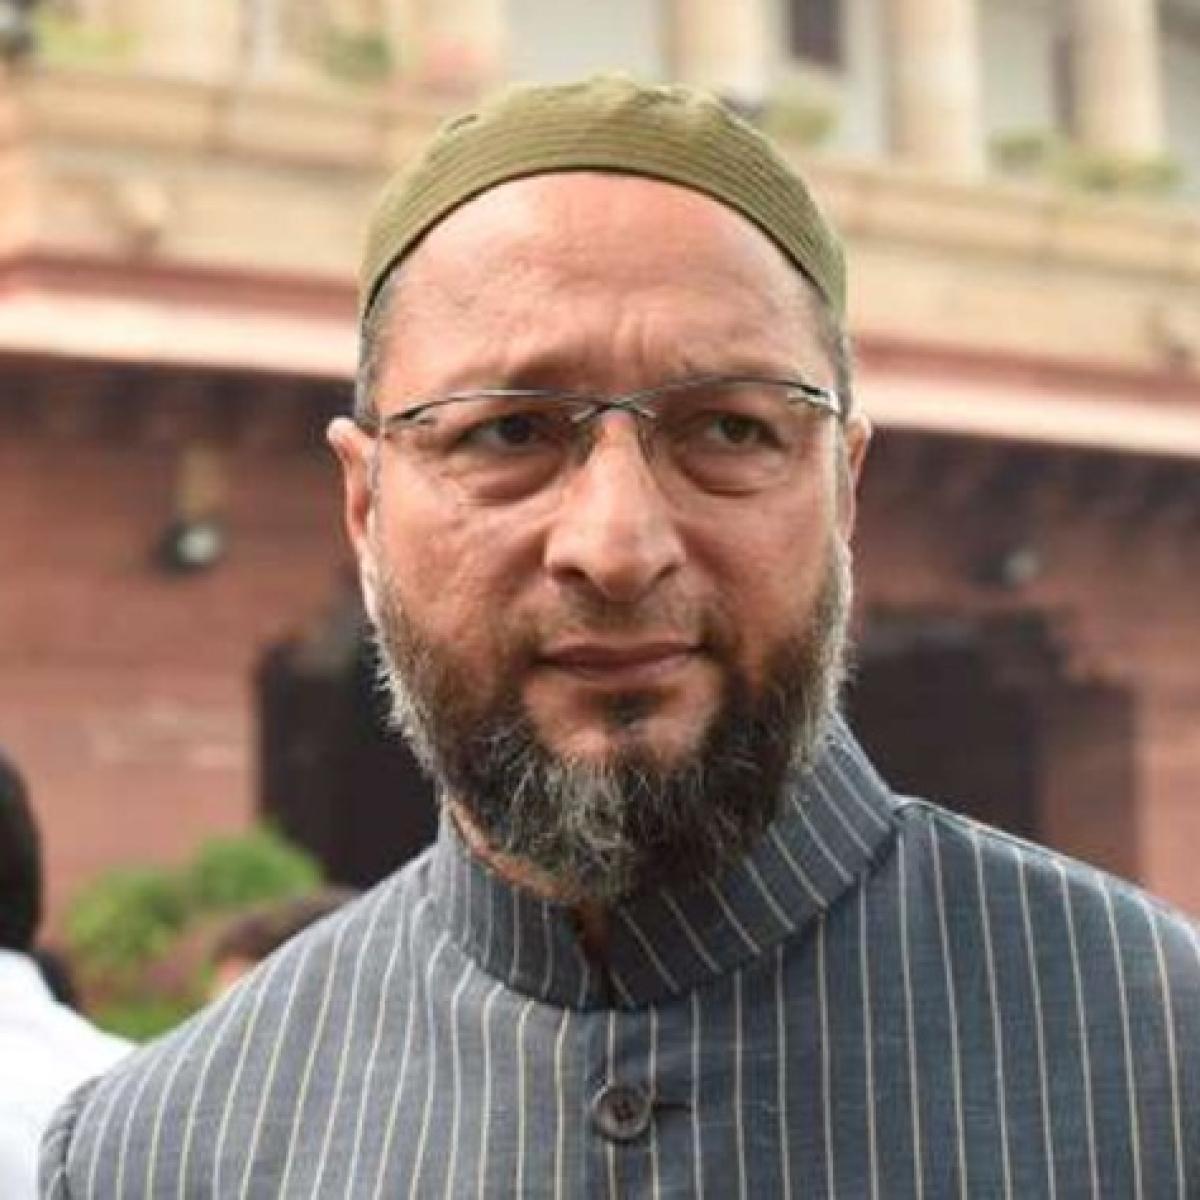 Shaheen Bagh may be turned into Jallianwala Bagh after Feb 8: Asaduddin Owaisi